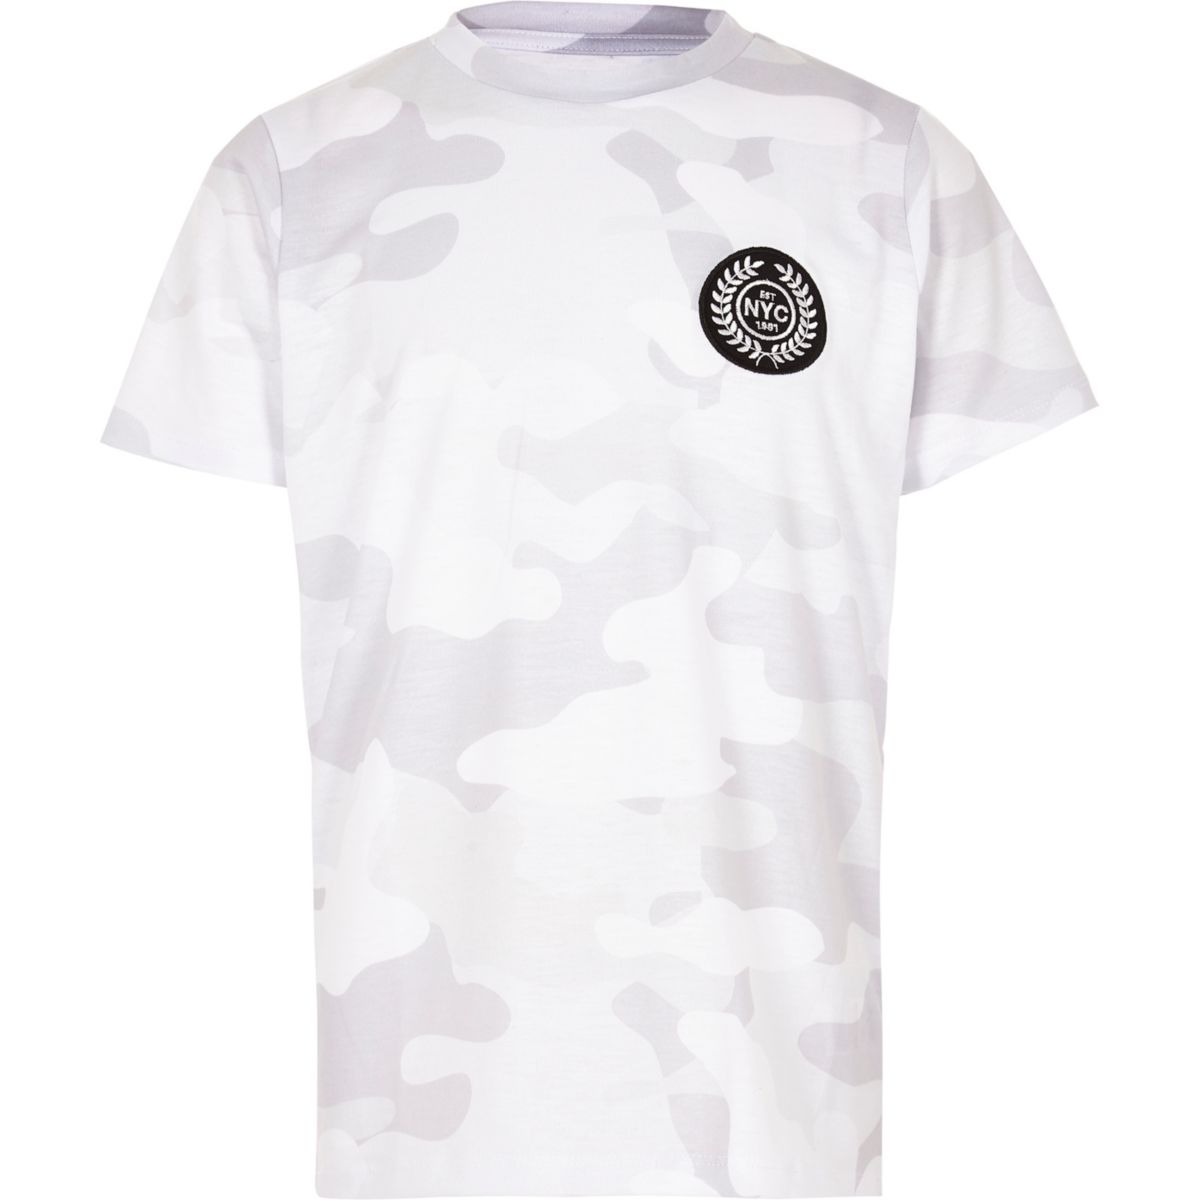 Boys white camo 'NYC' badge T-shirt